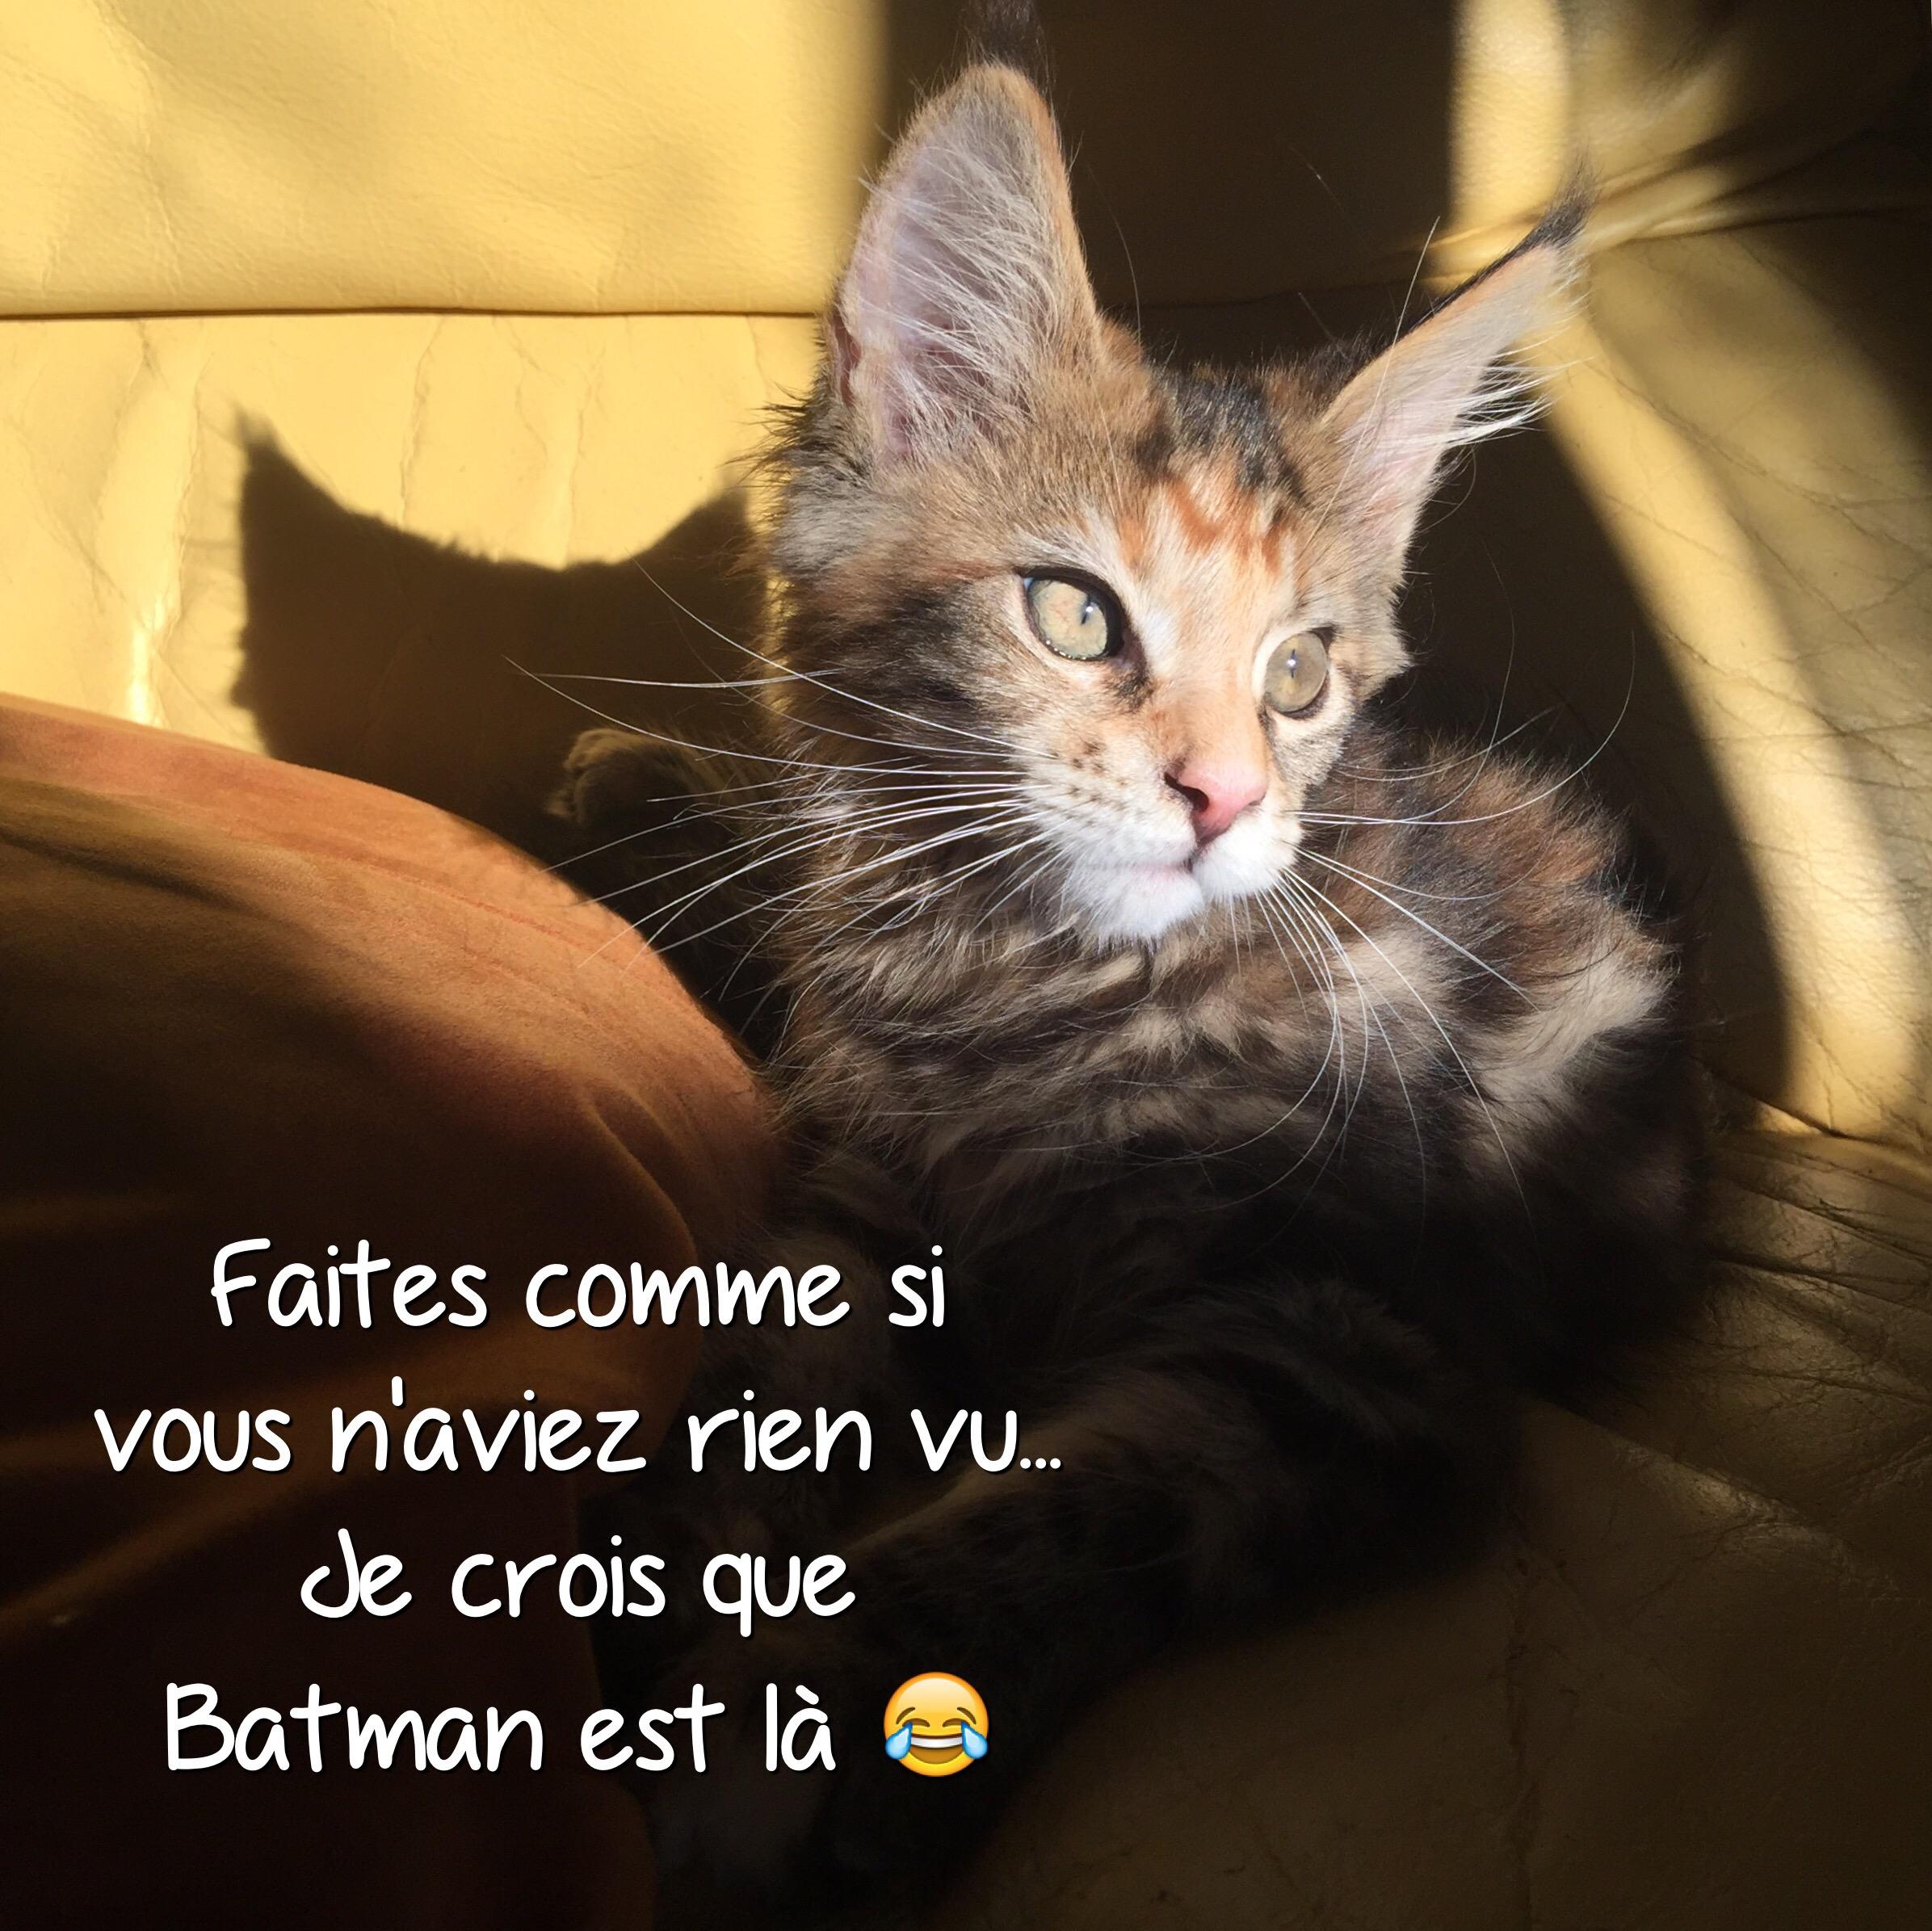 Vie de chat: Mamour a vu Batman